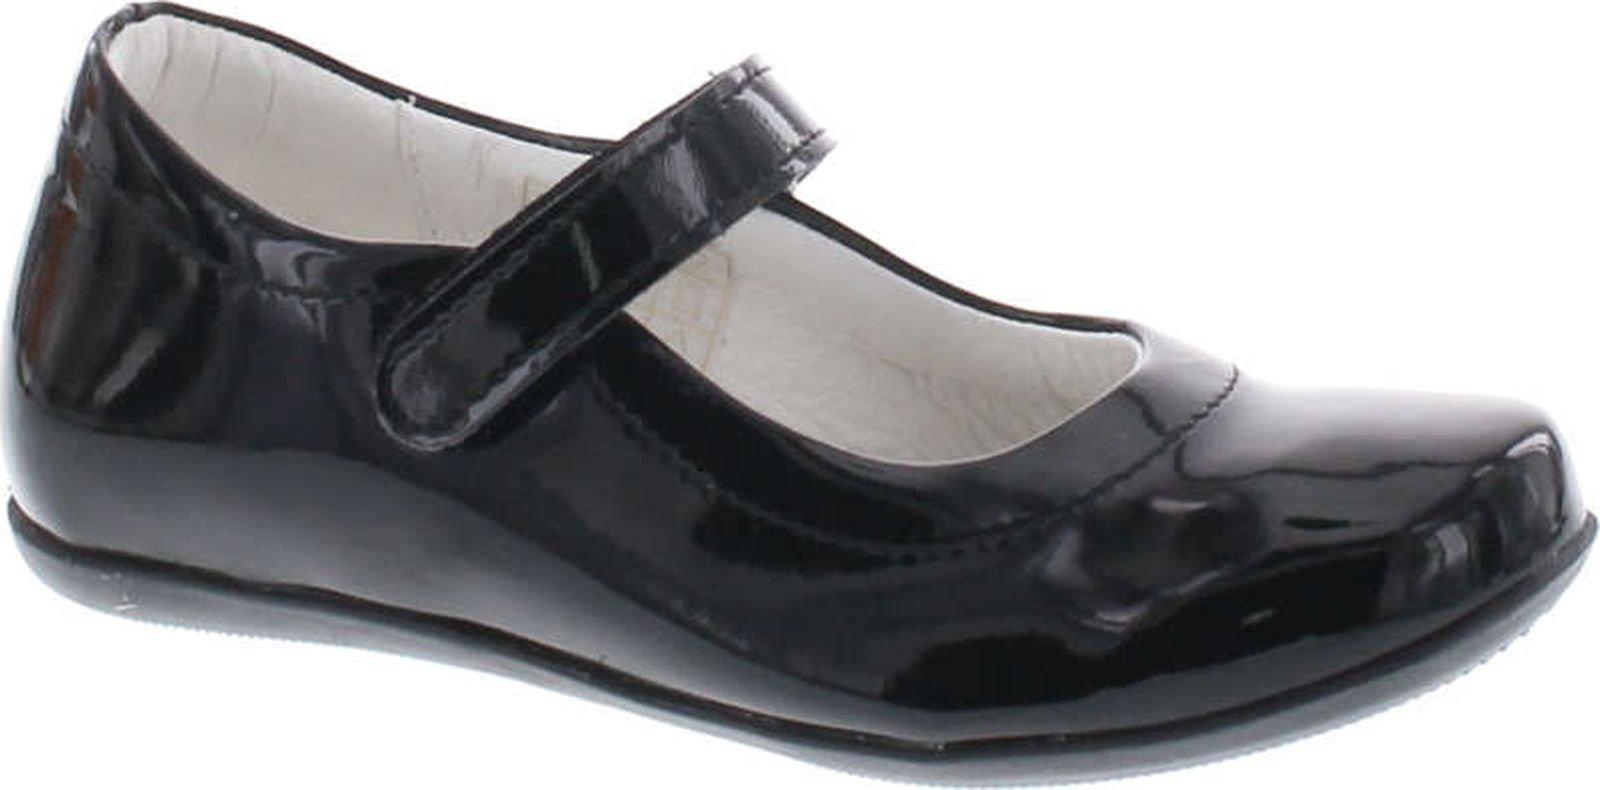 Primigi Girls Zura Dress Ankle Strap Mary Jane Flats Shoes,Black Patent,27